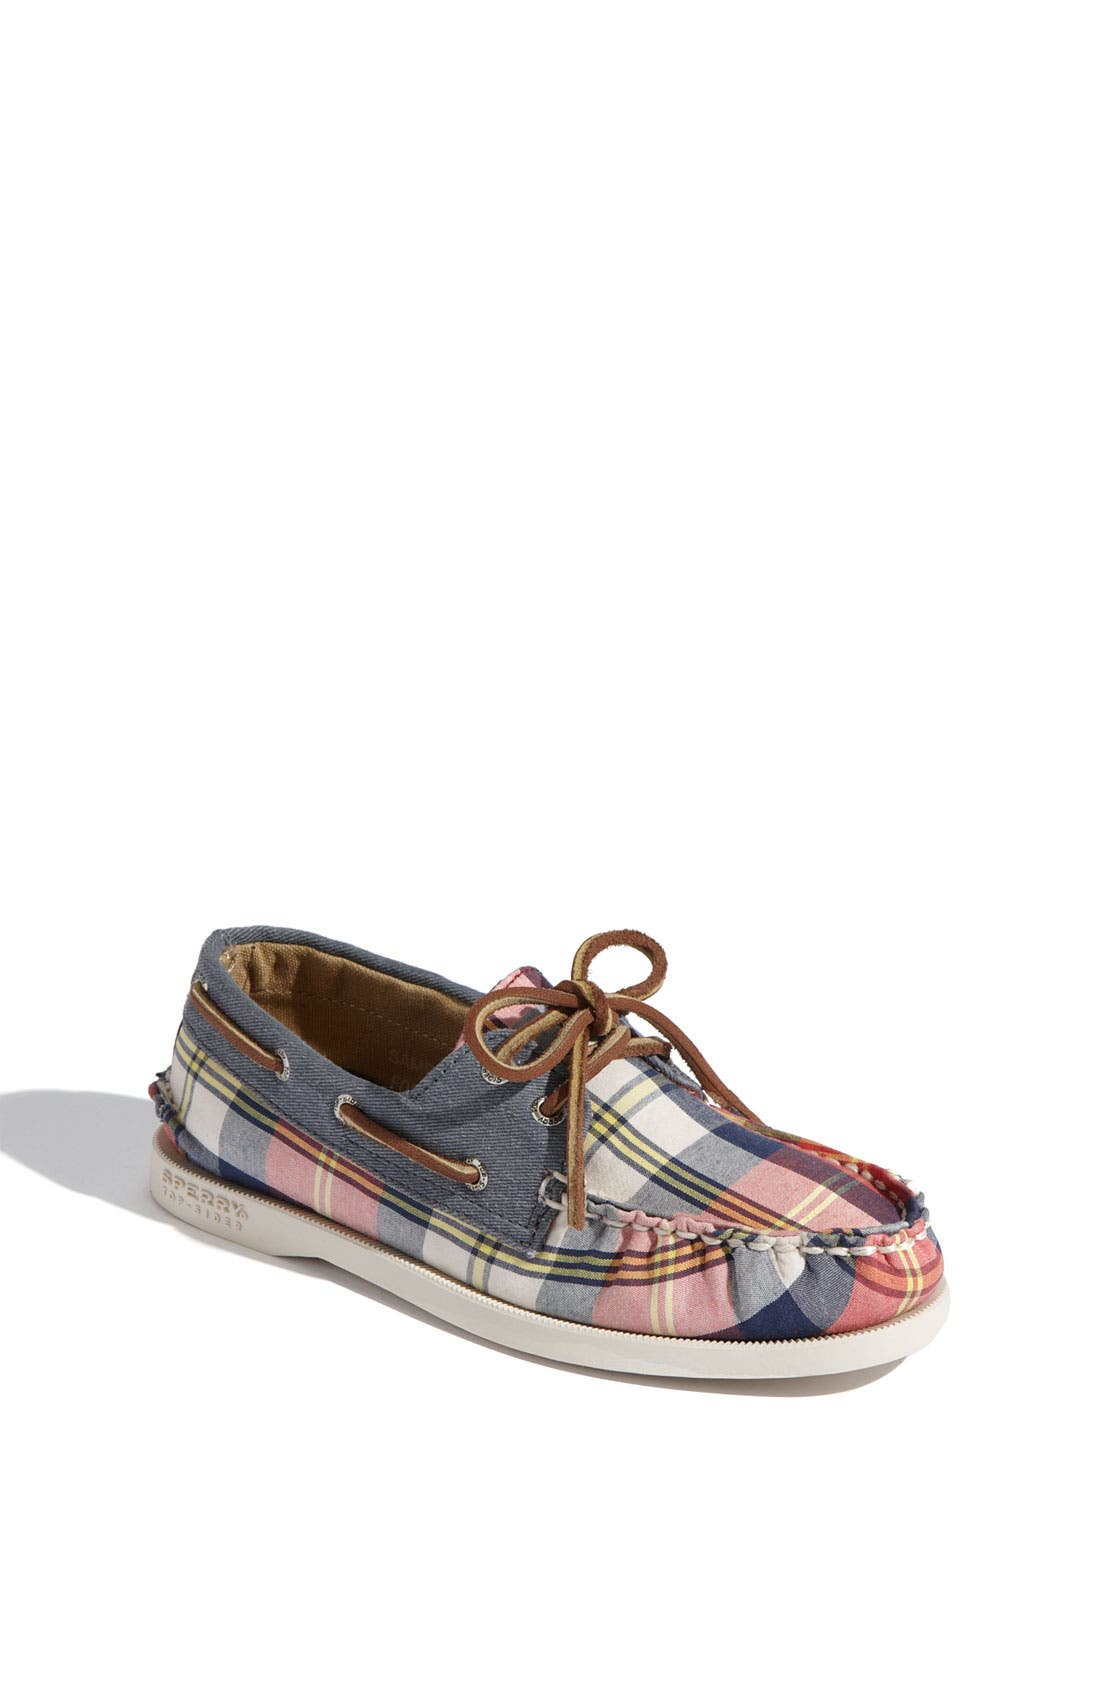 Alternate Image 1 Selected - Sperry Top-Sider® 'Authentic Original Plaid' Boat Shoe (Walker & Toddler)